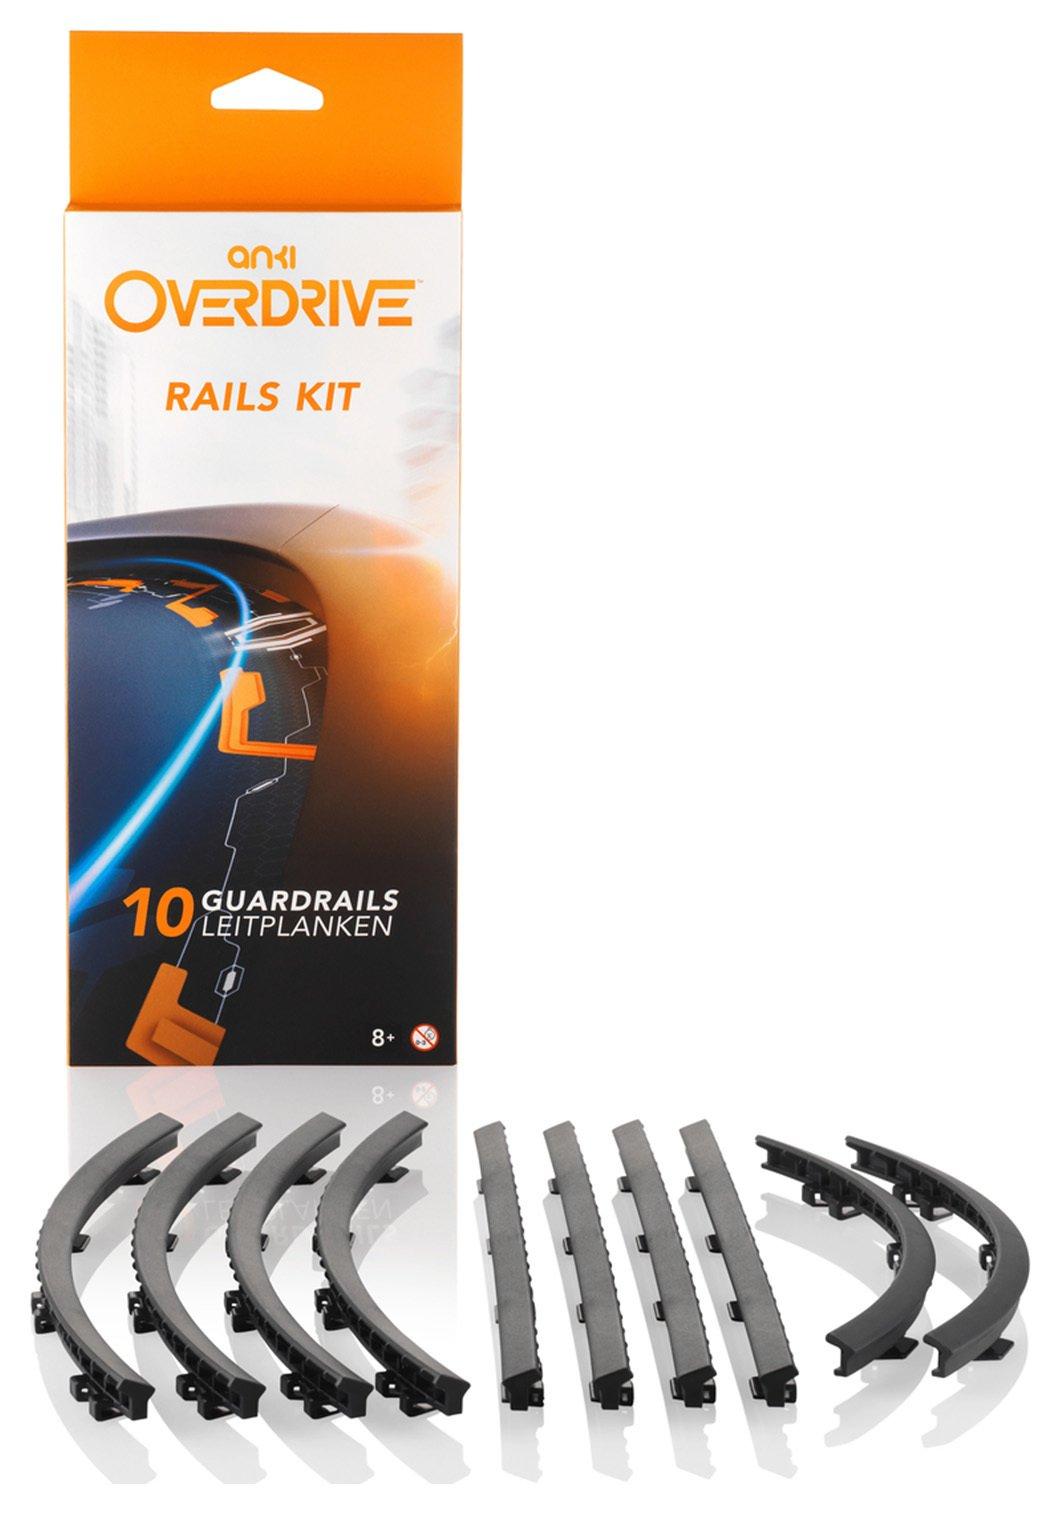 Image of anki Overdrive Accessory - Rail Kit